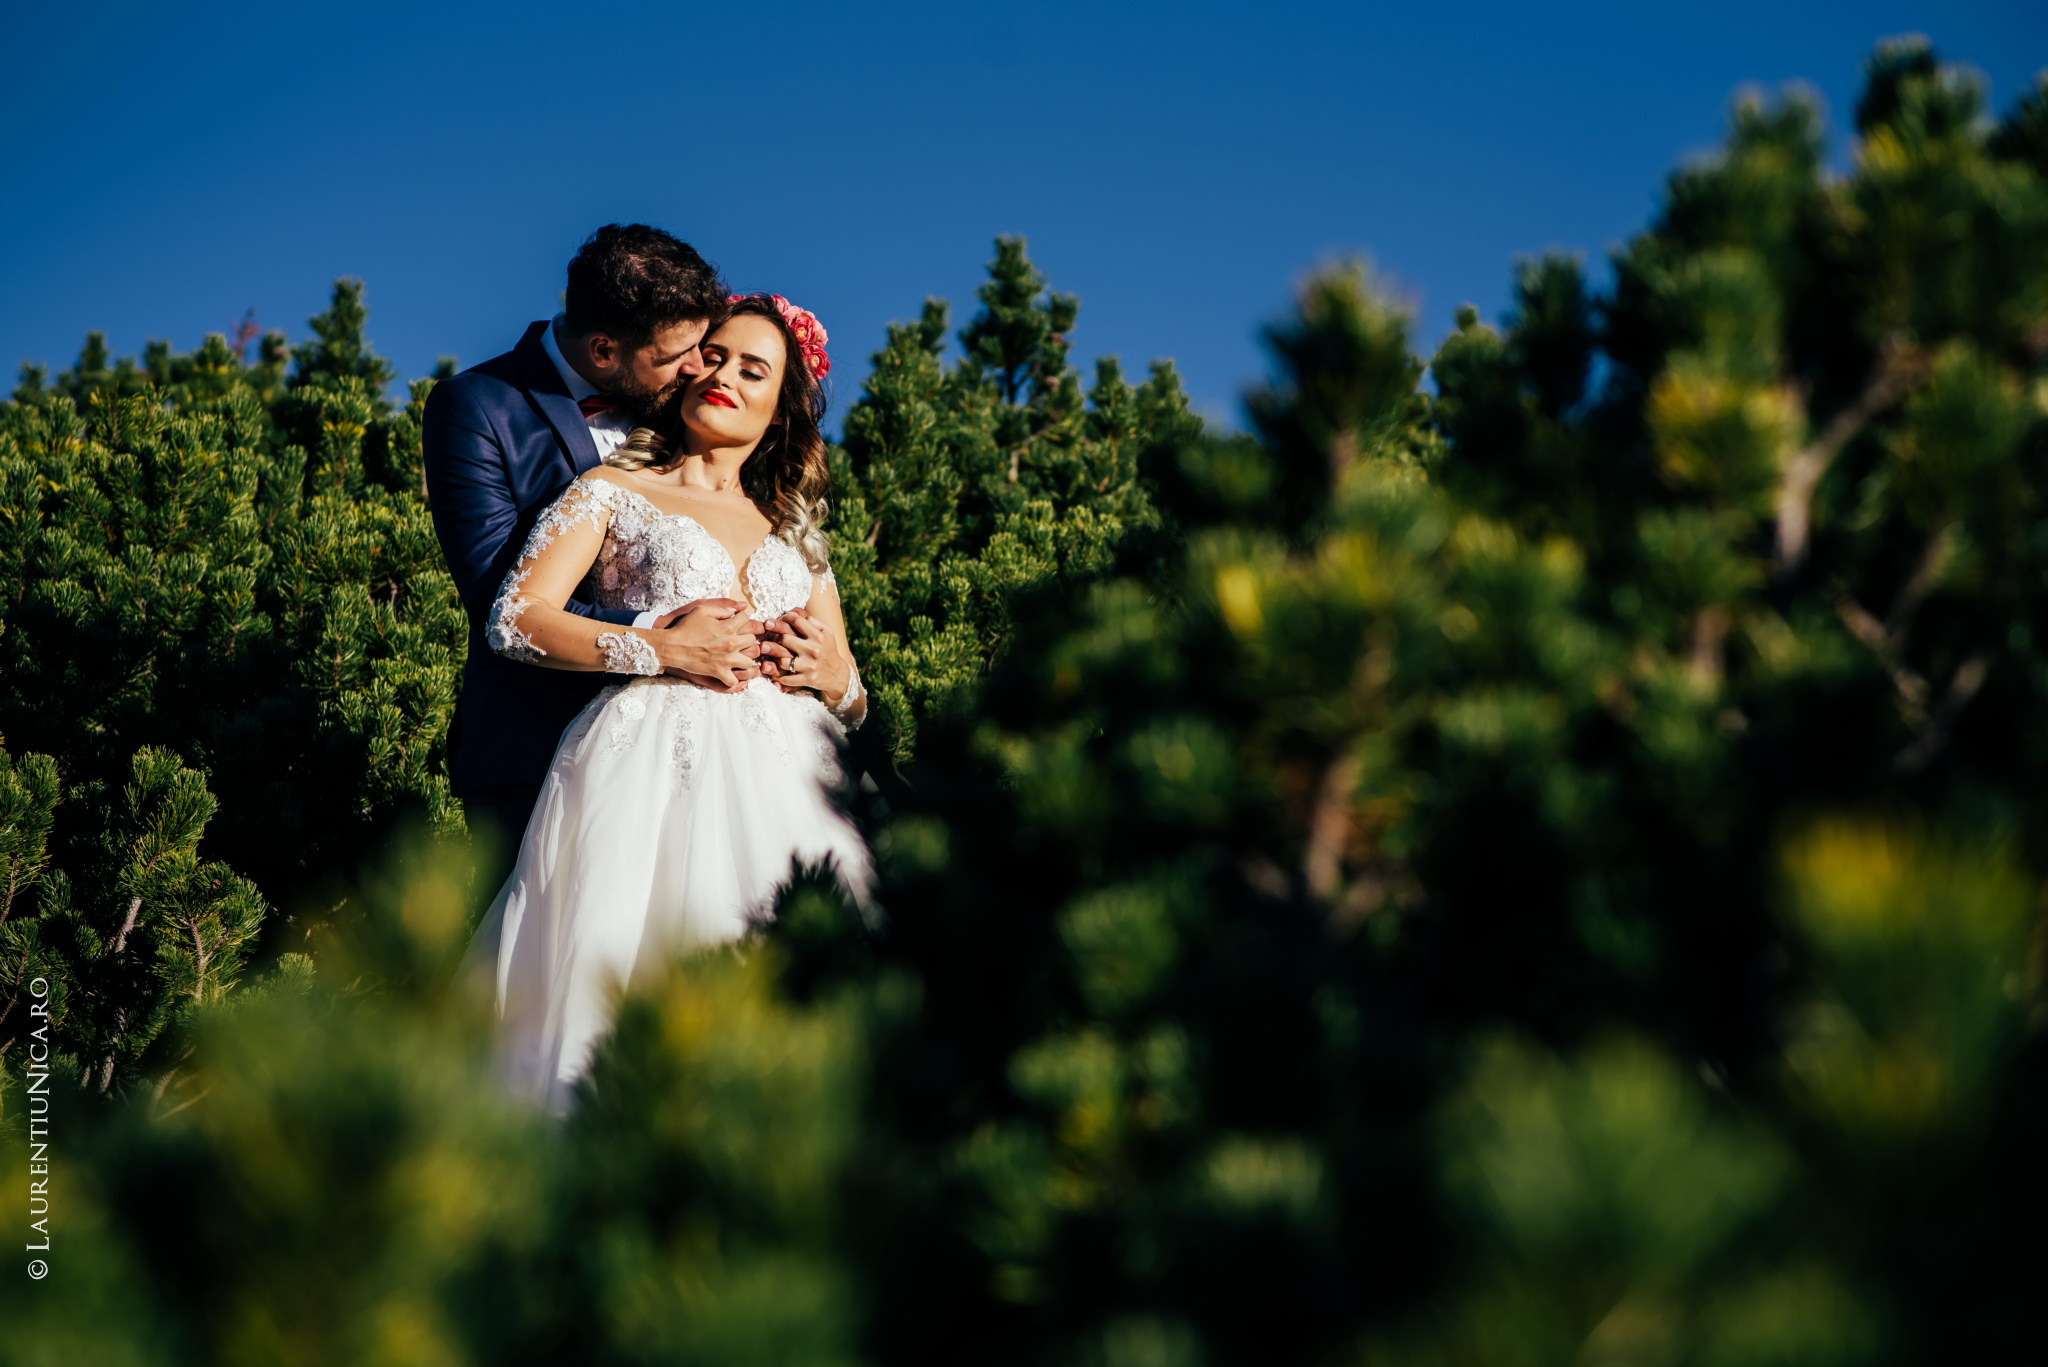 aida si alin fotograf nunta laurentiu nica transalpina 15 - Aida & Alin | Fotografii After Wedding | Transalpina - Muntii Parang